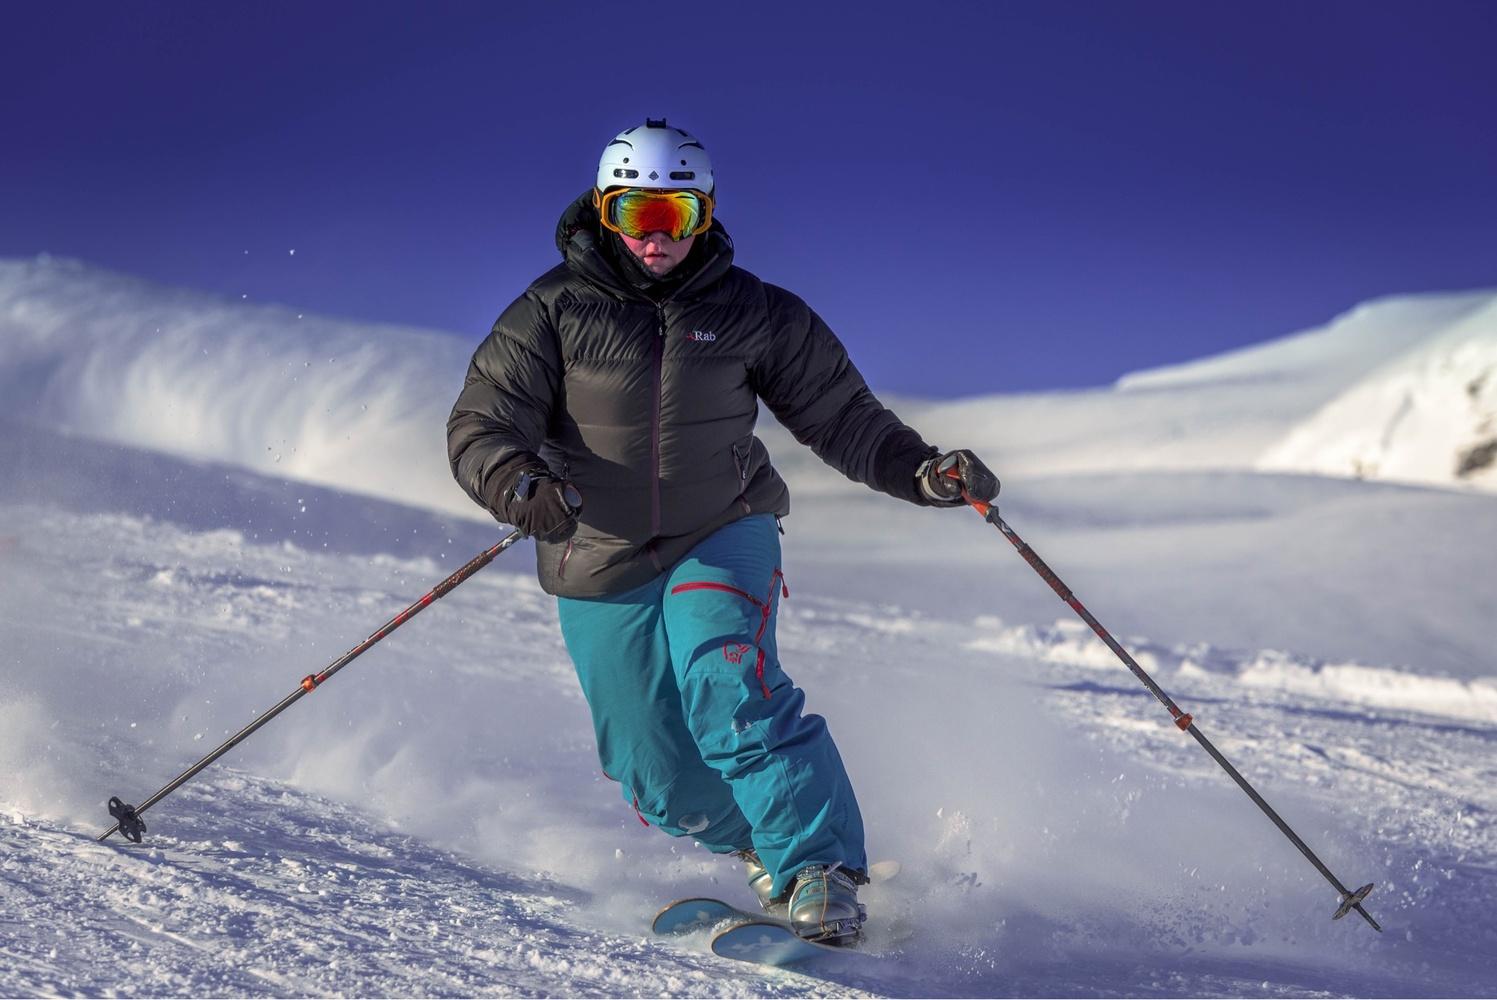 Skiing by Annelin Hoff